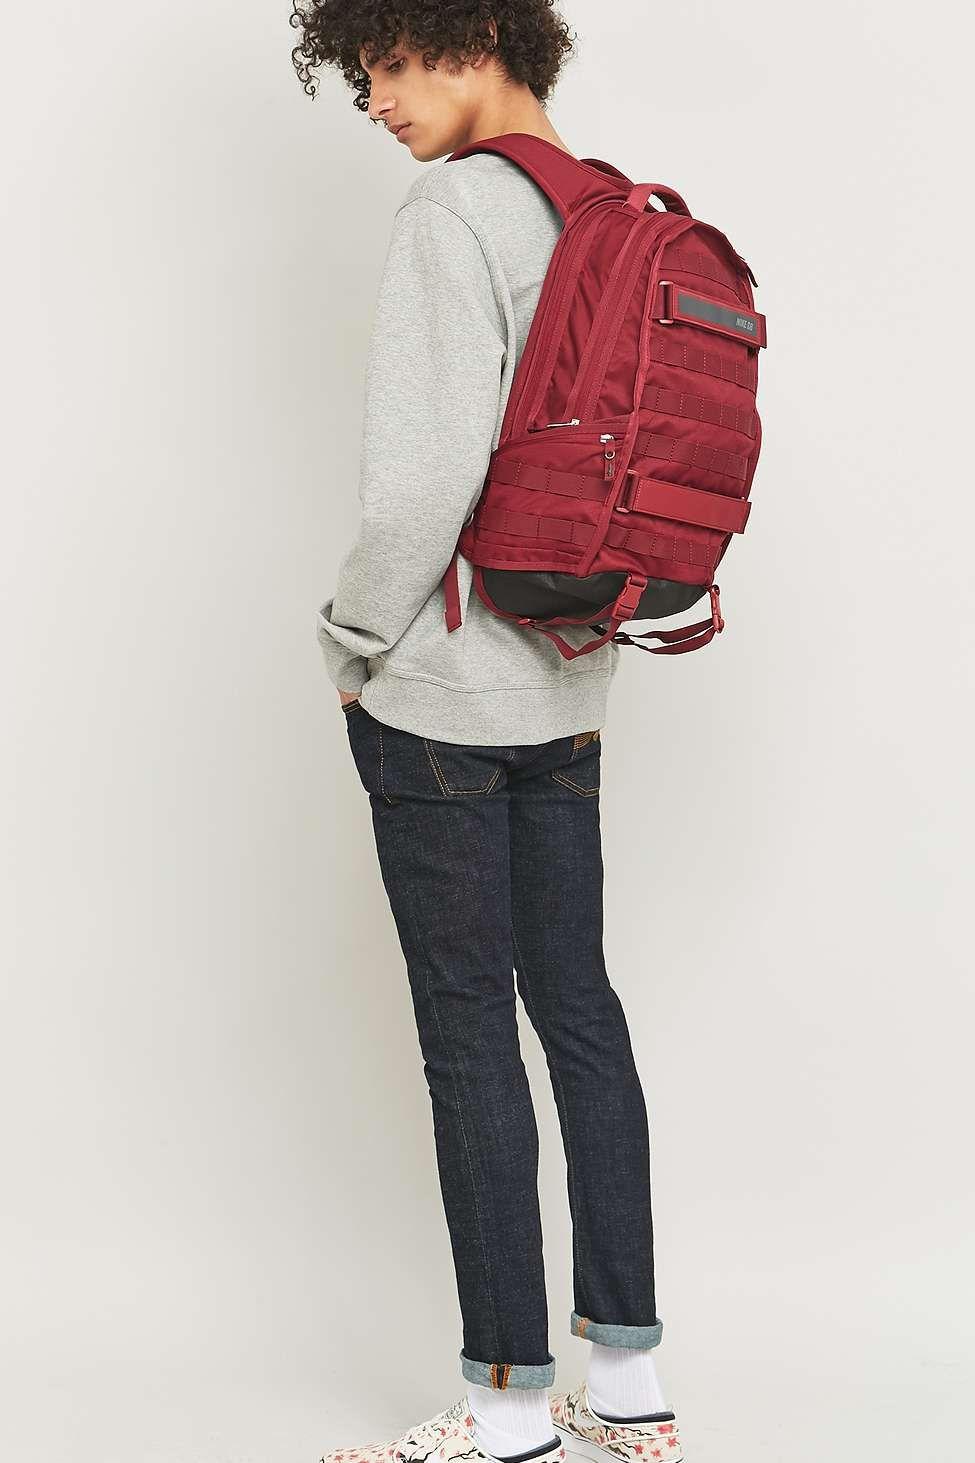 Nike - Sac à dos SB RPM bordeaux | Sac, Urban outfitters et Mode